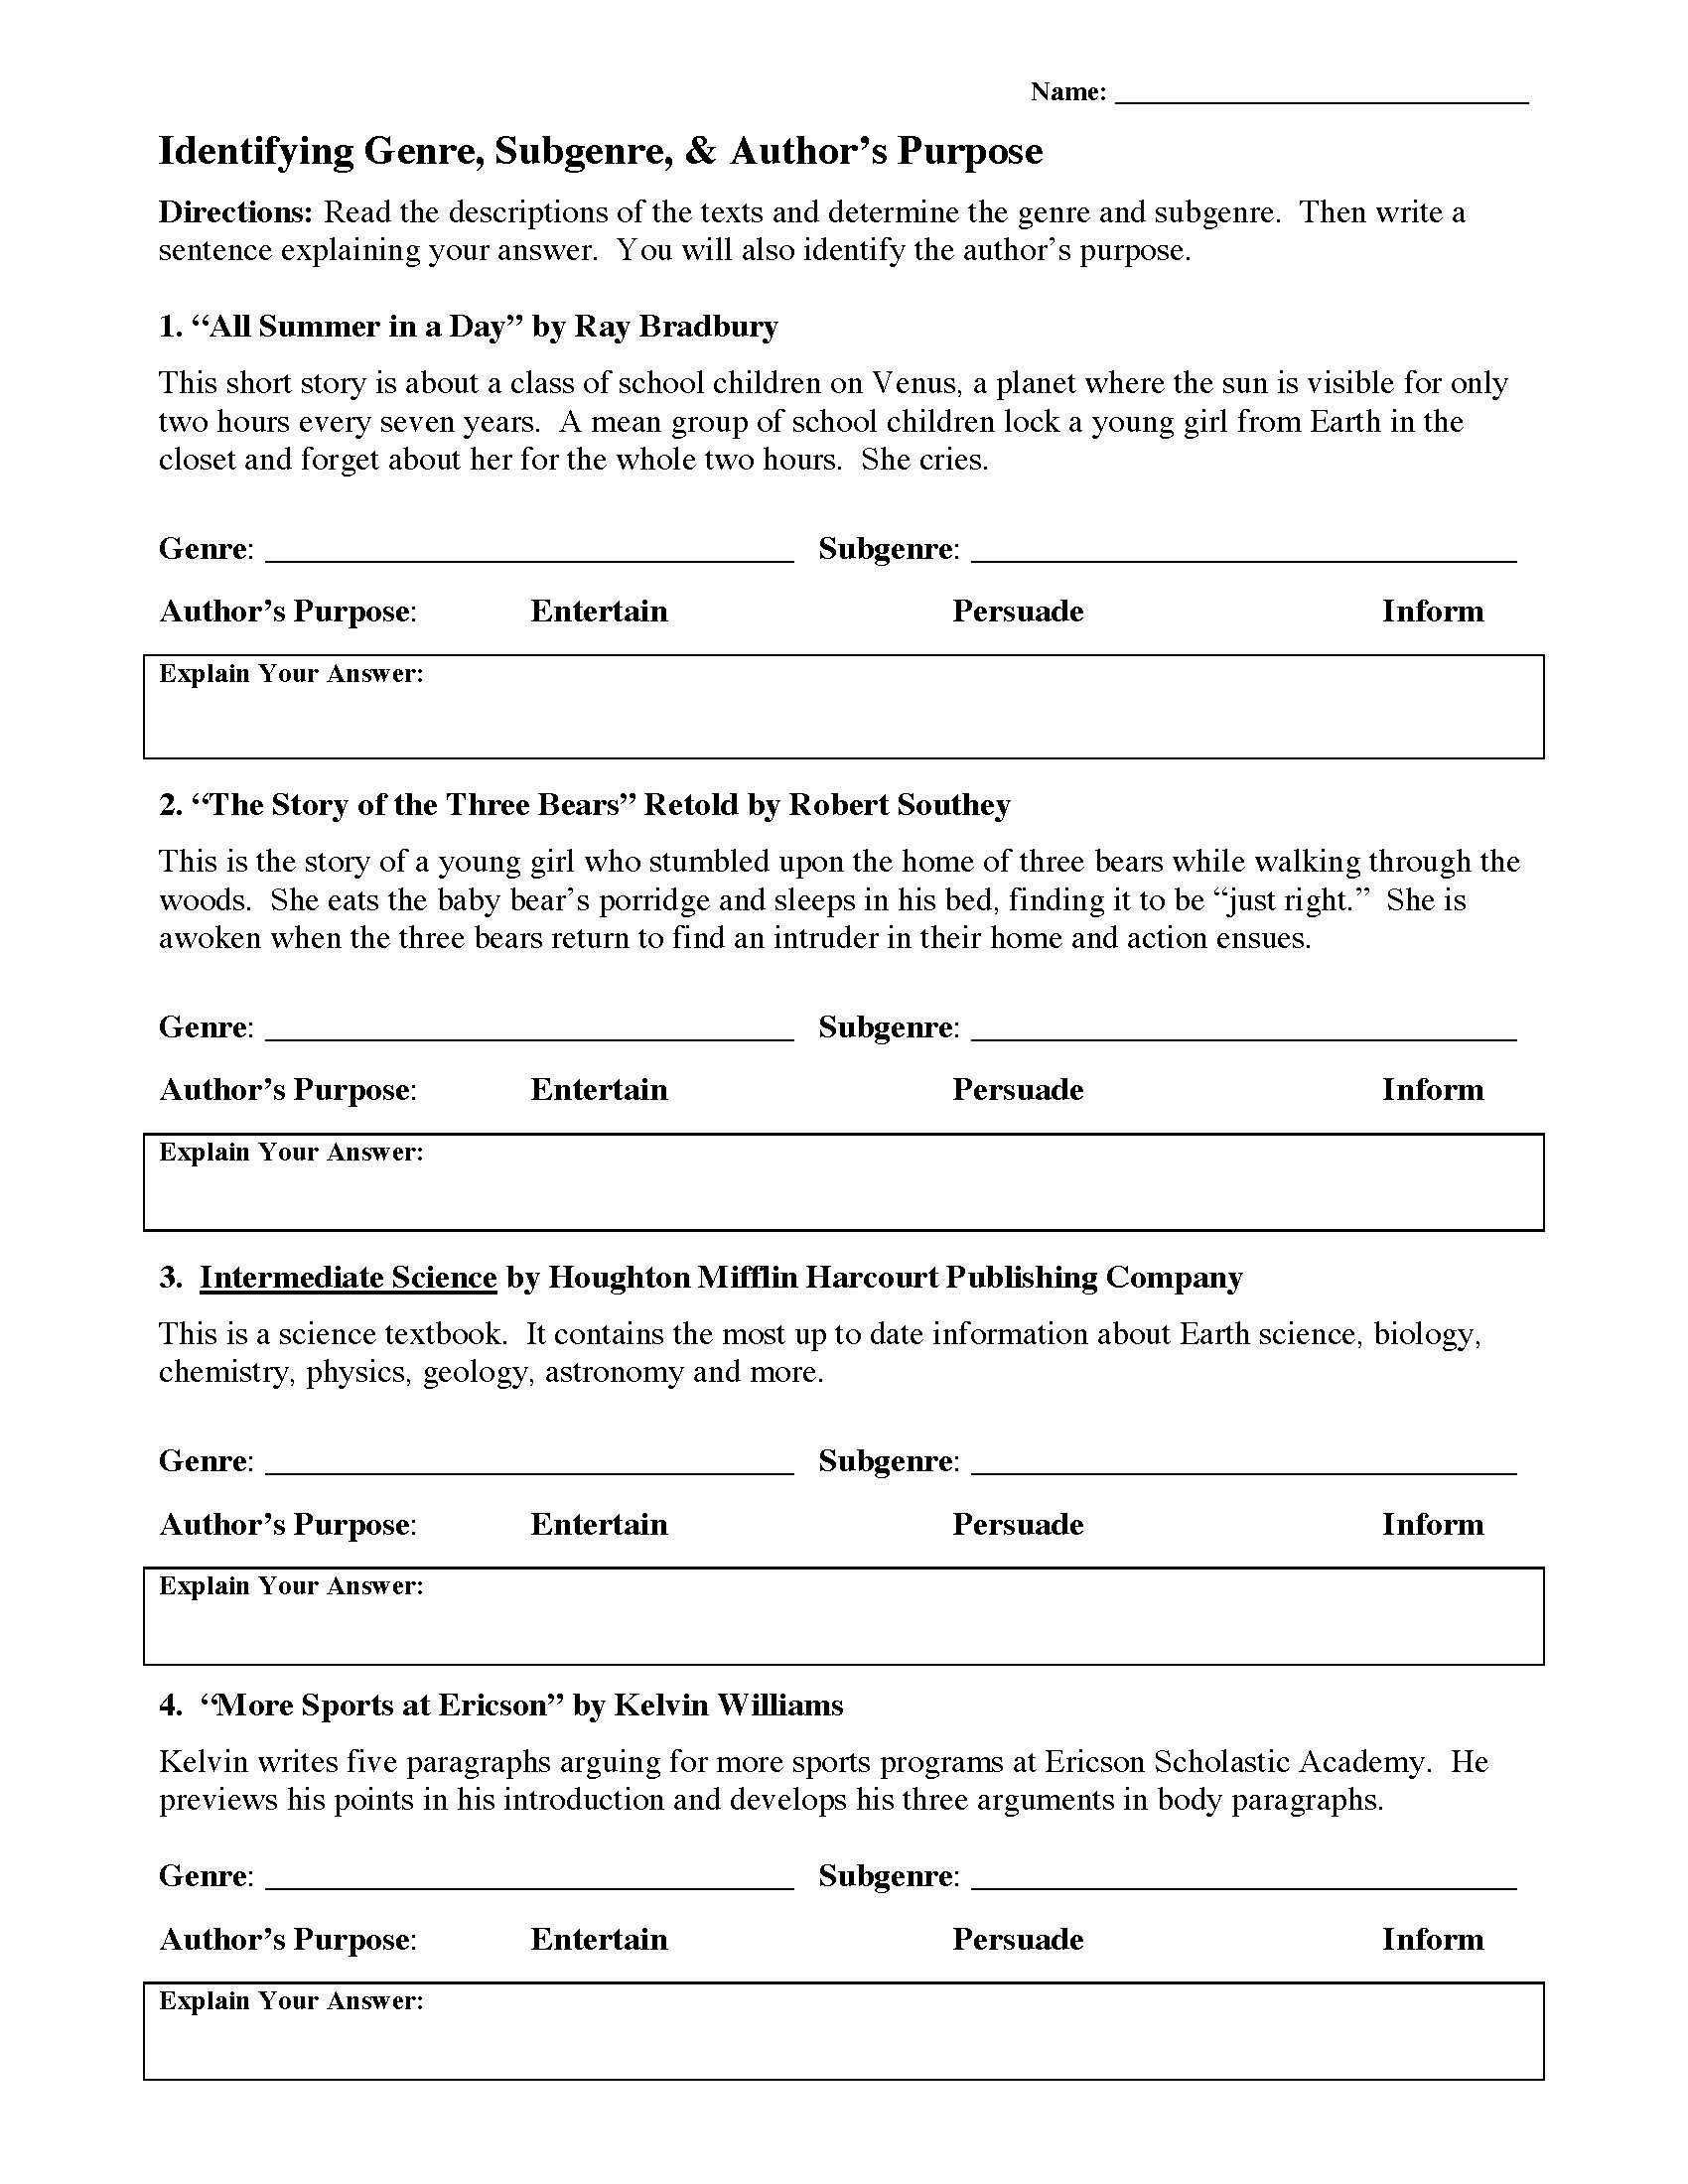 Genre Worksheets 4th Grade Genre Worksheet 1 Answers Promotiontablecovers